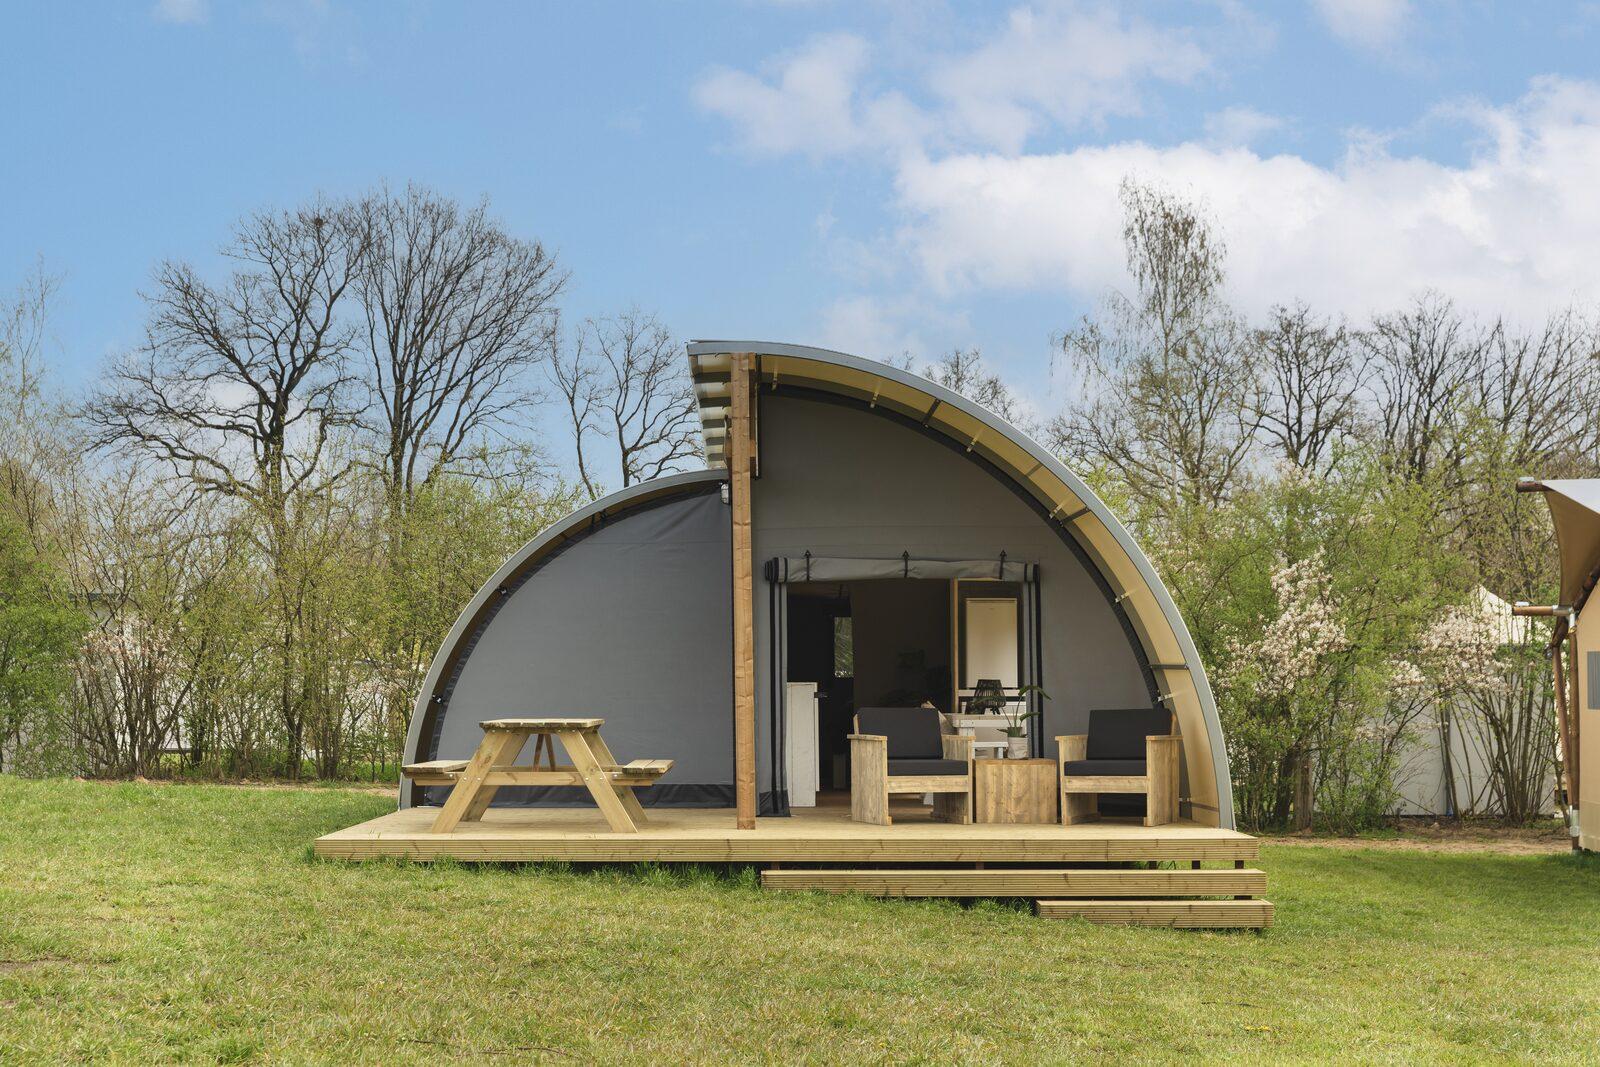 https://www.molke.nl/accommodaties/panorama-lodge-met-prive-sanitair-en-weids-uitzicht